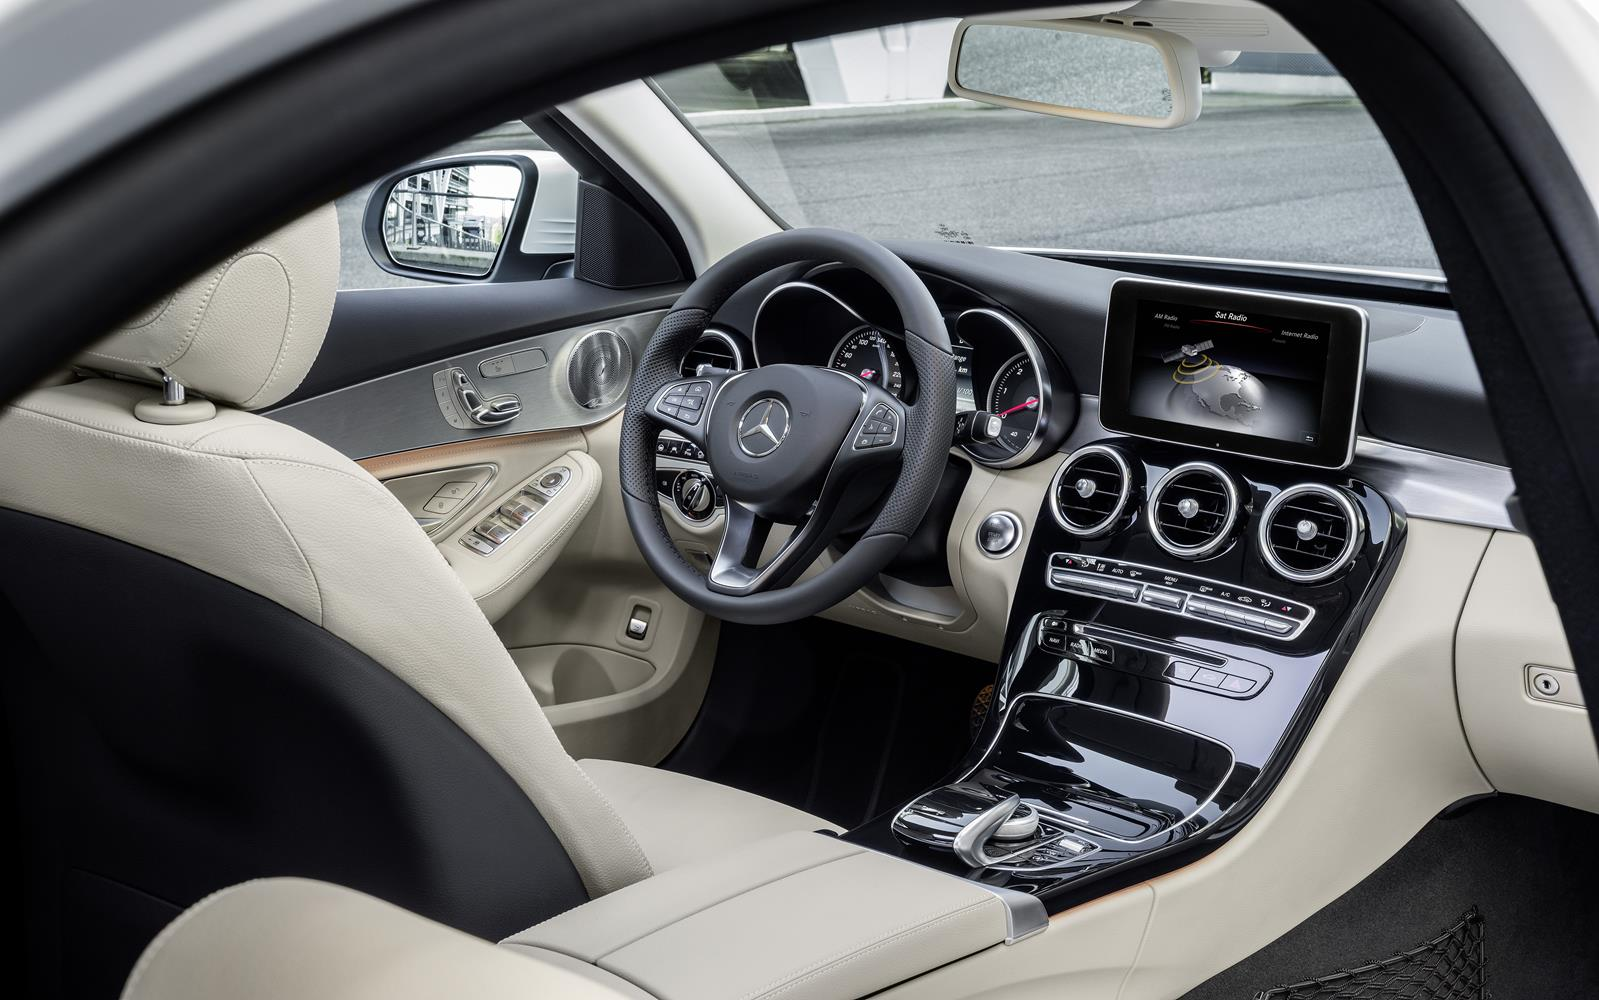 Mercedes C-Class 2014 Dashboard FrontSeatDriver.co.uk